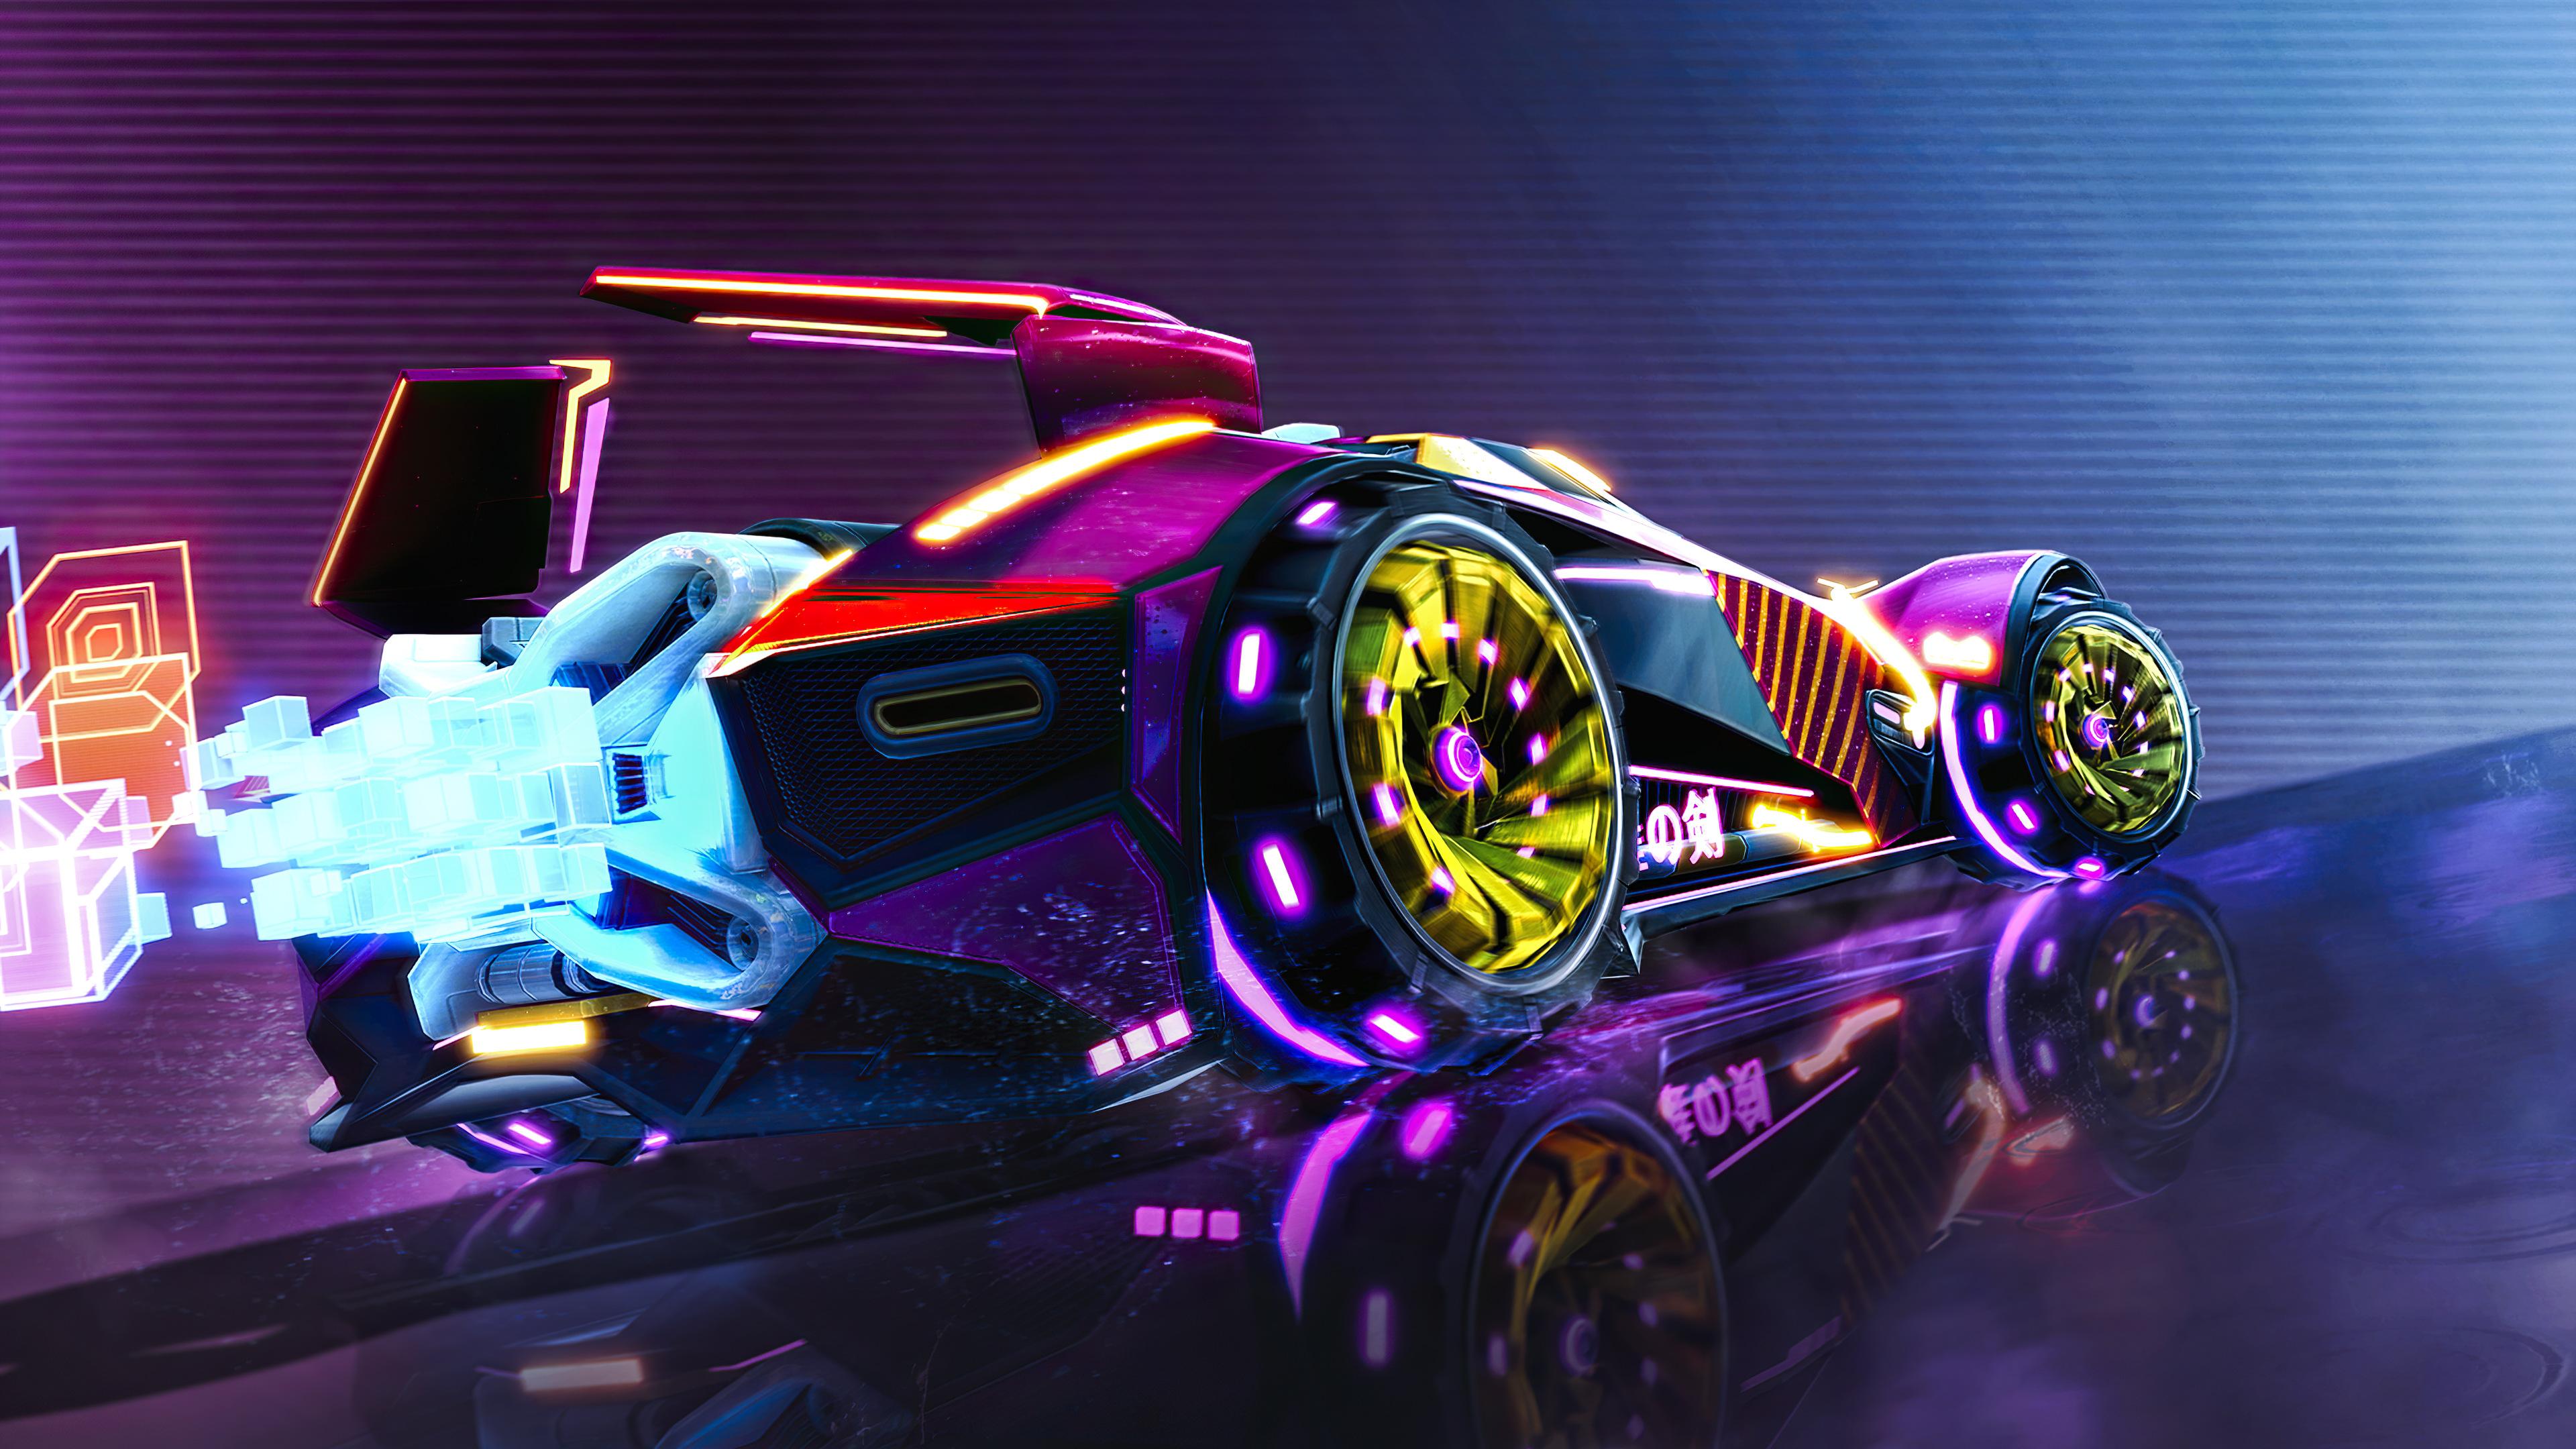 Full screen hd 4k car wallpaper for pc. Neon Car Rocket League Vaporwave Digital Art 4k Wallpaper 6 2184